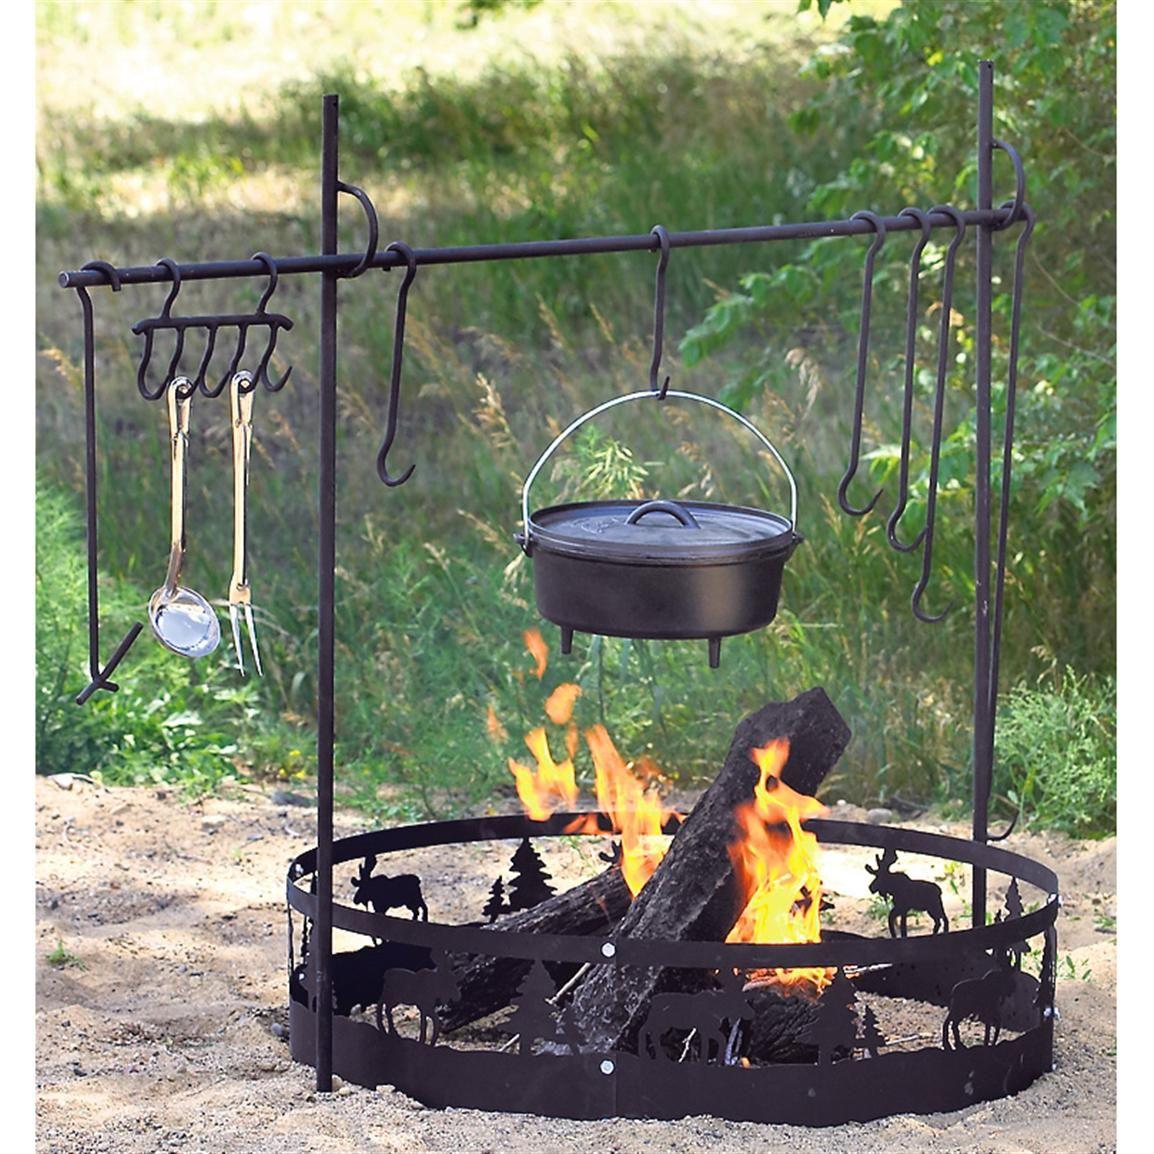 Guide Gear Campfire Cook Set - 1162294, Utensils Cookware at Sportsman's Guide